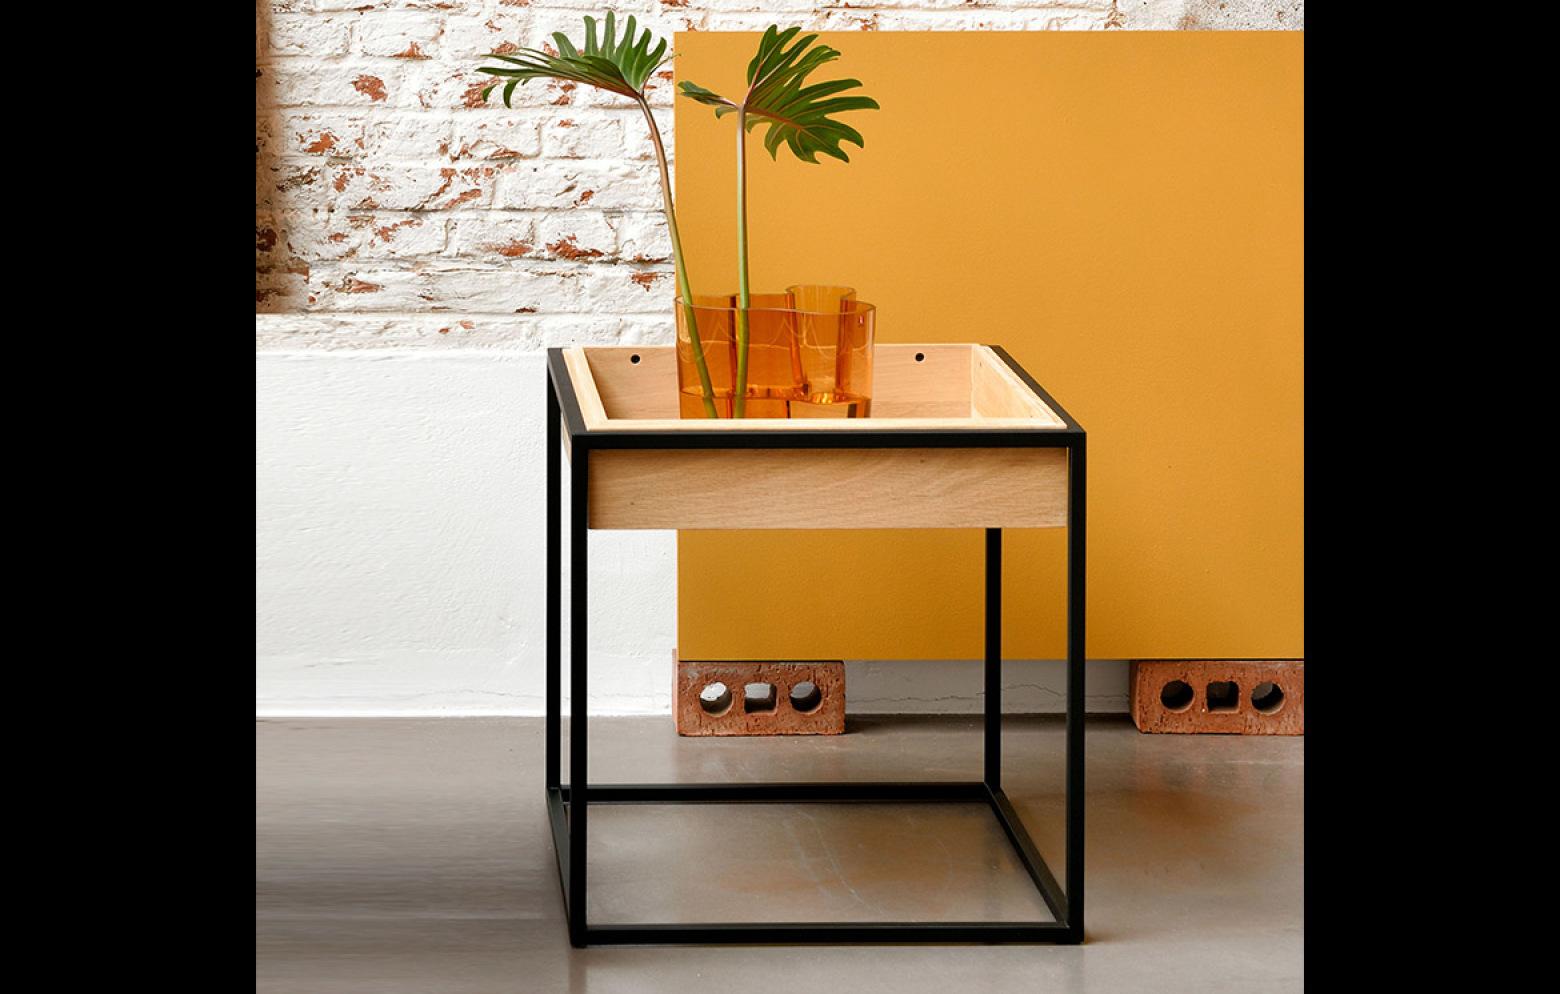 monolit couchtische kleinm bel accessoires who 39 s. Black Bedroom Furniture Sets. Home Design Ideas